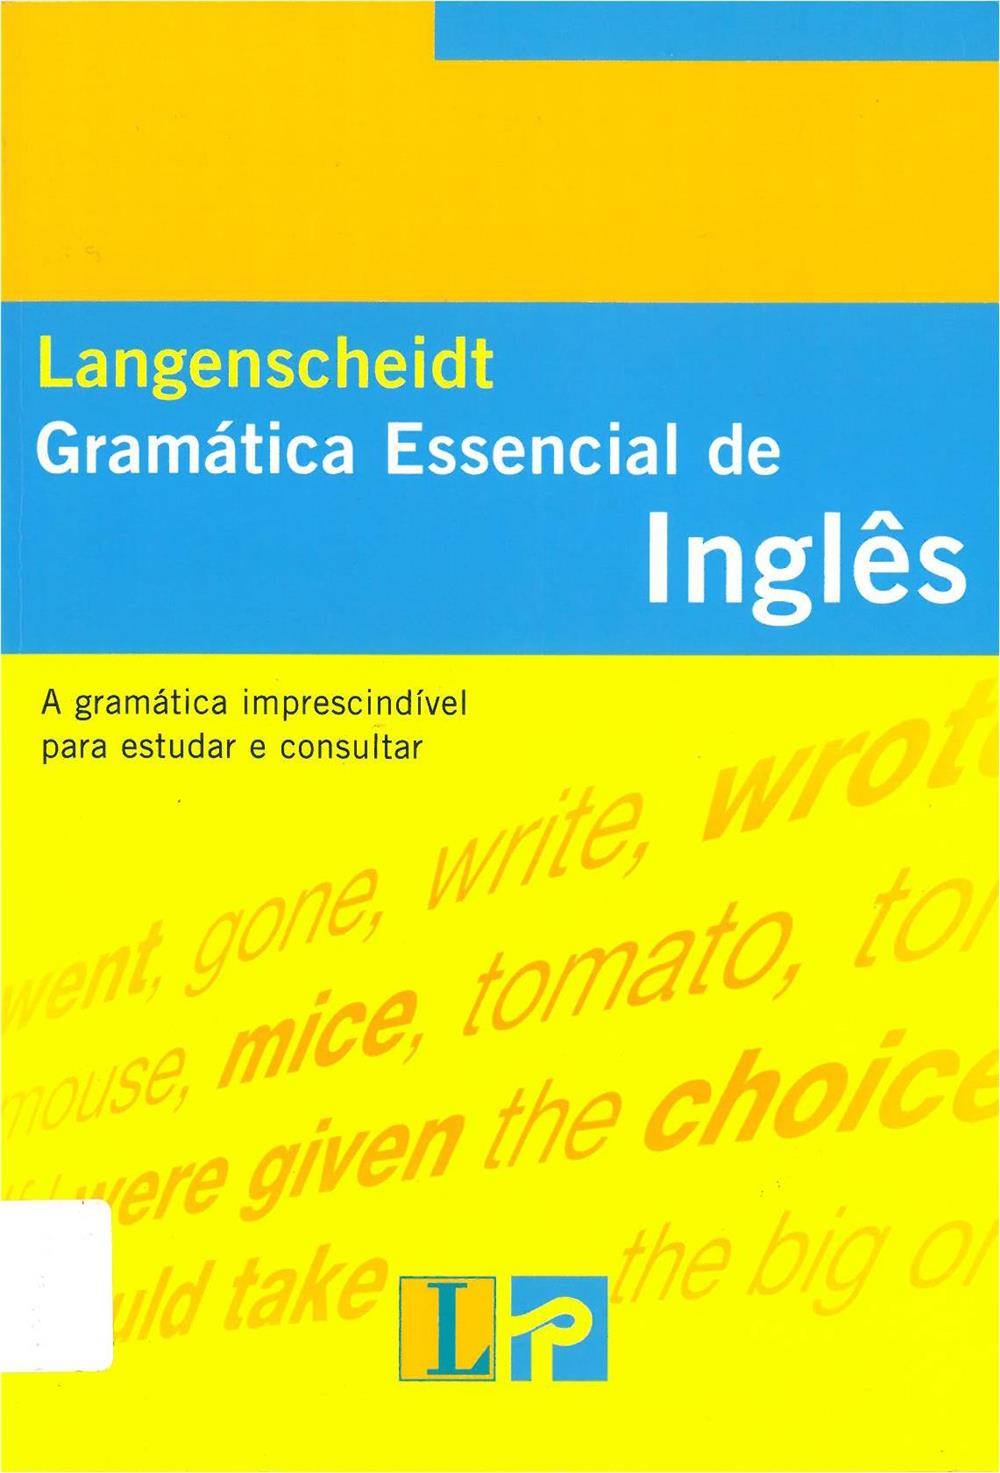 Gramática essencial de inglês_.jpg